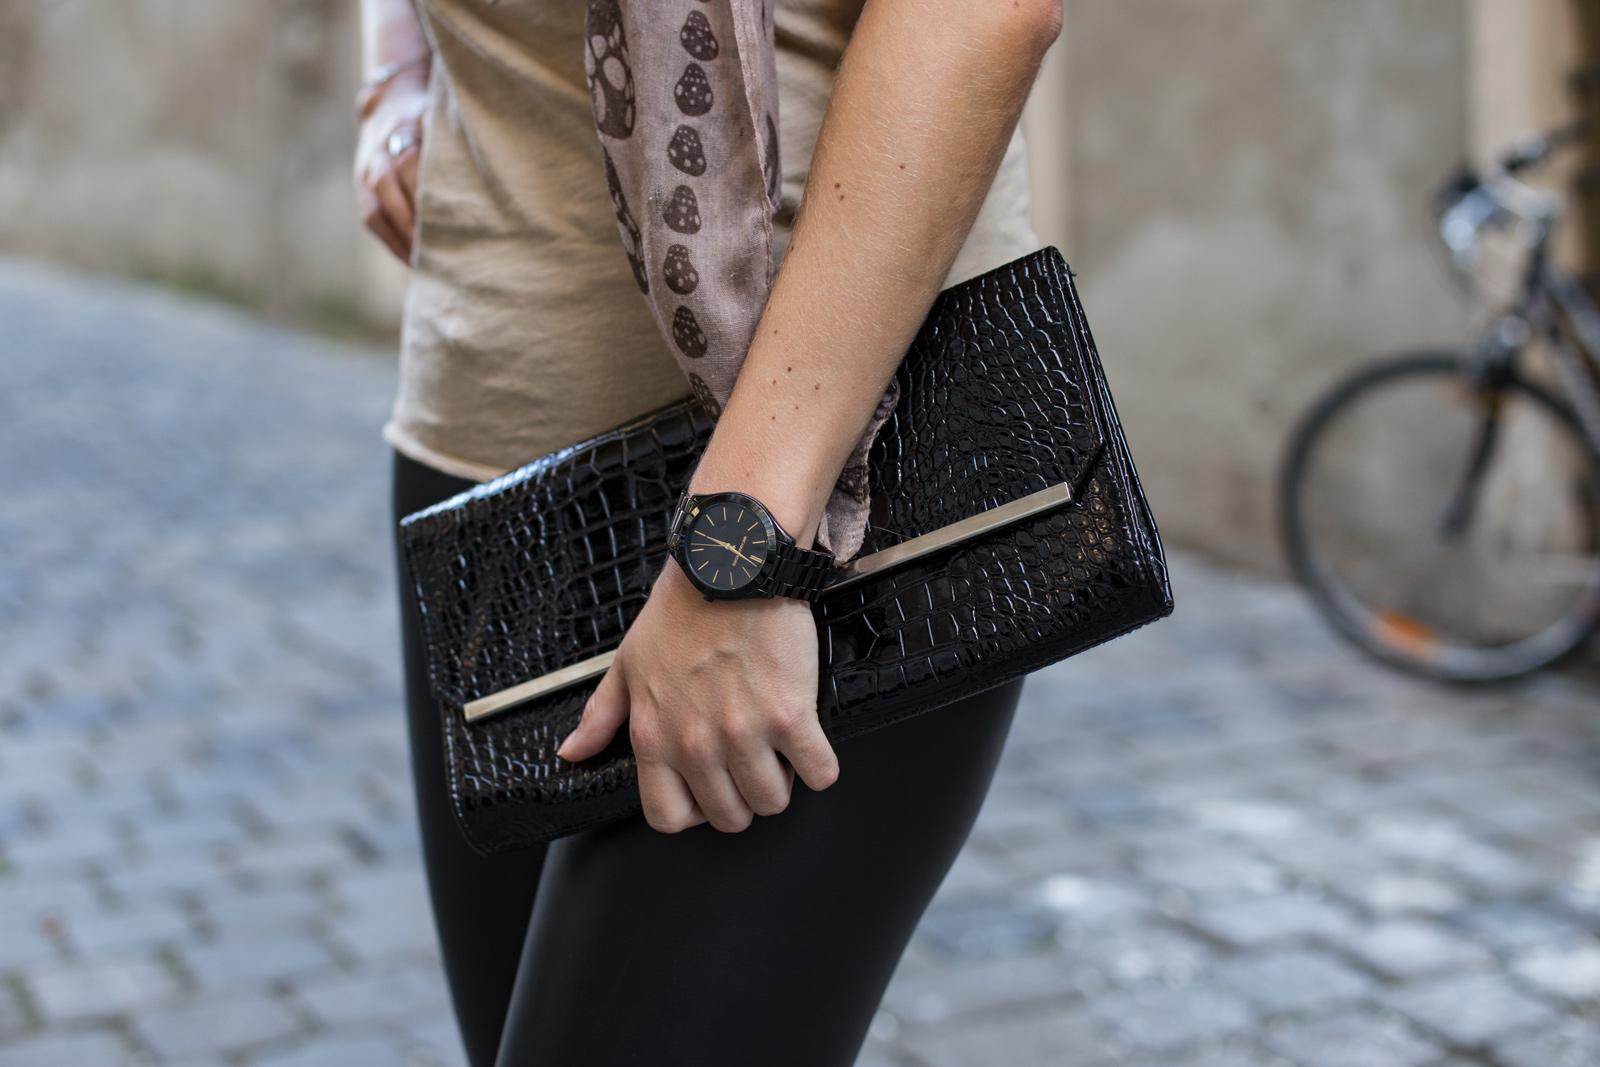 Foto_by_Nadja_Nemetz_Wien_Outfit_Fashion_Mode_Modeblogger_Blogger_1